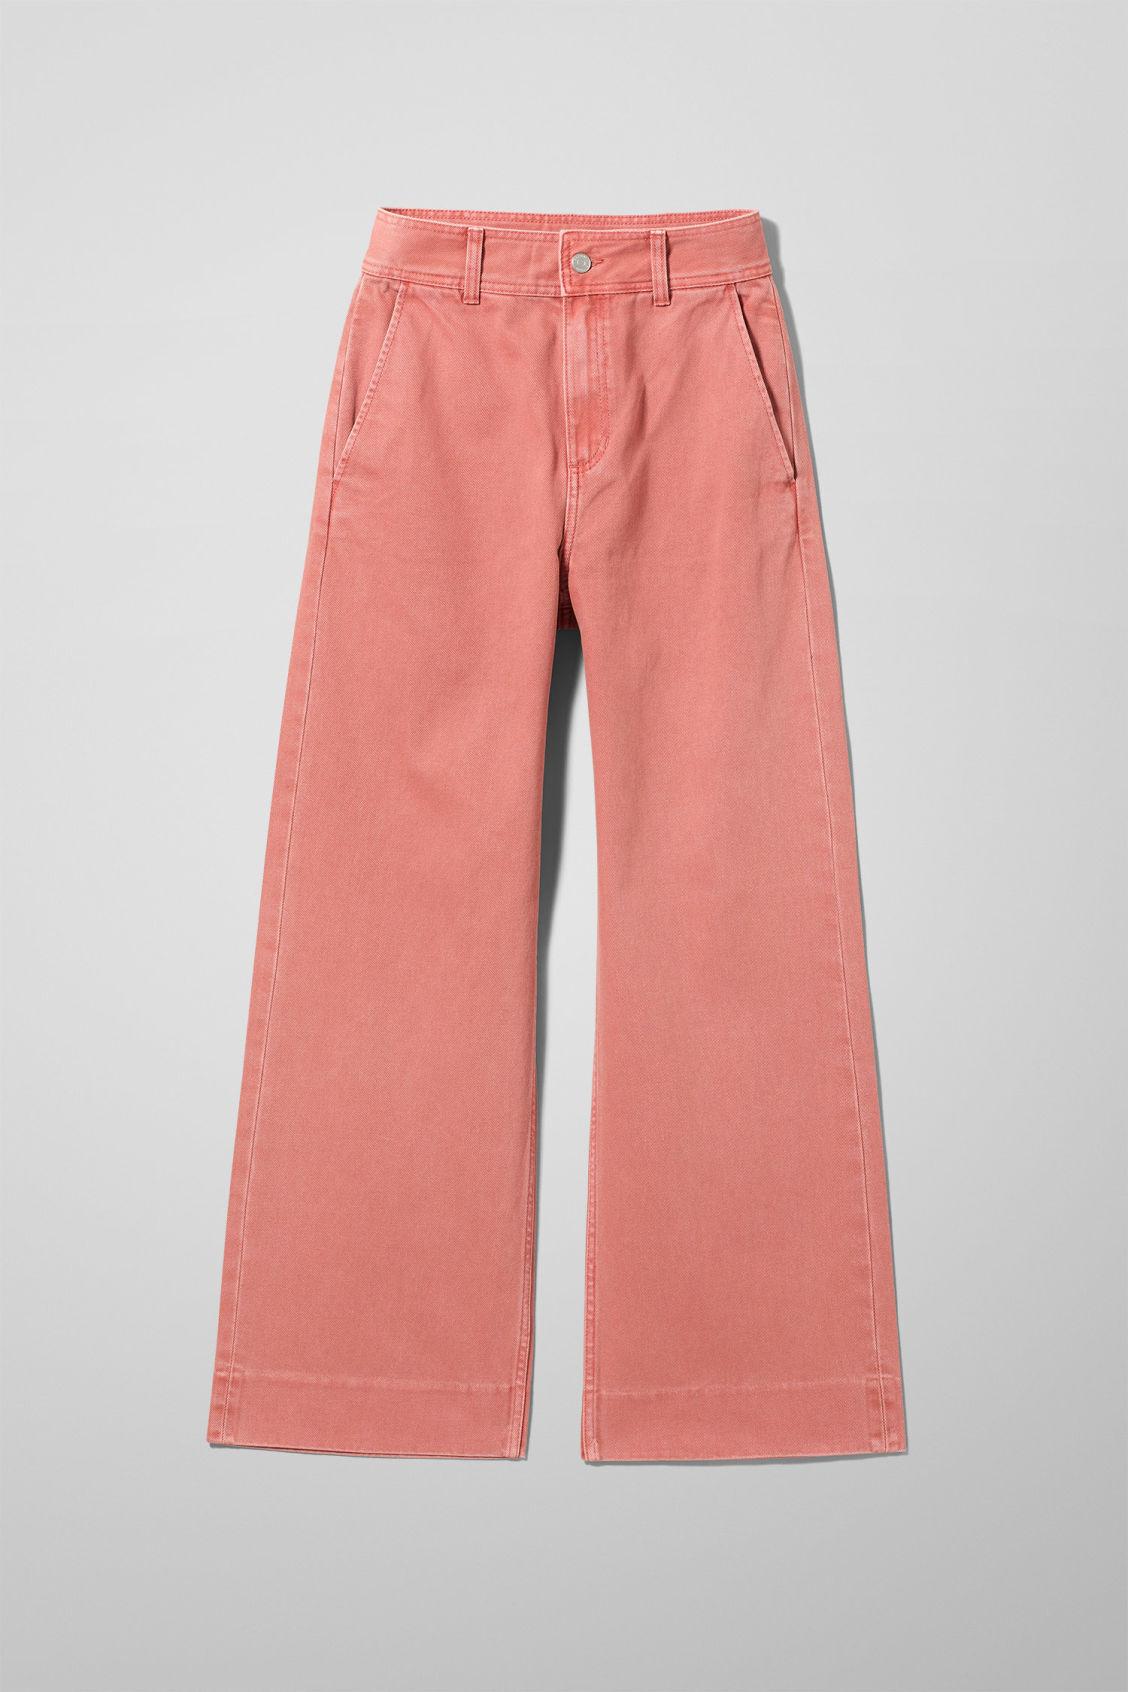 Cory Rose Denim Trousers - Orange-40